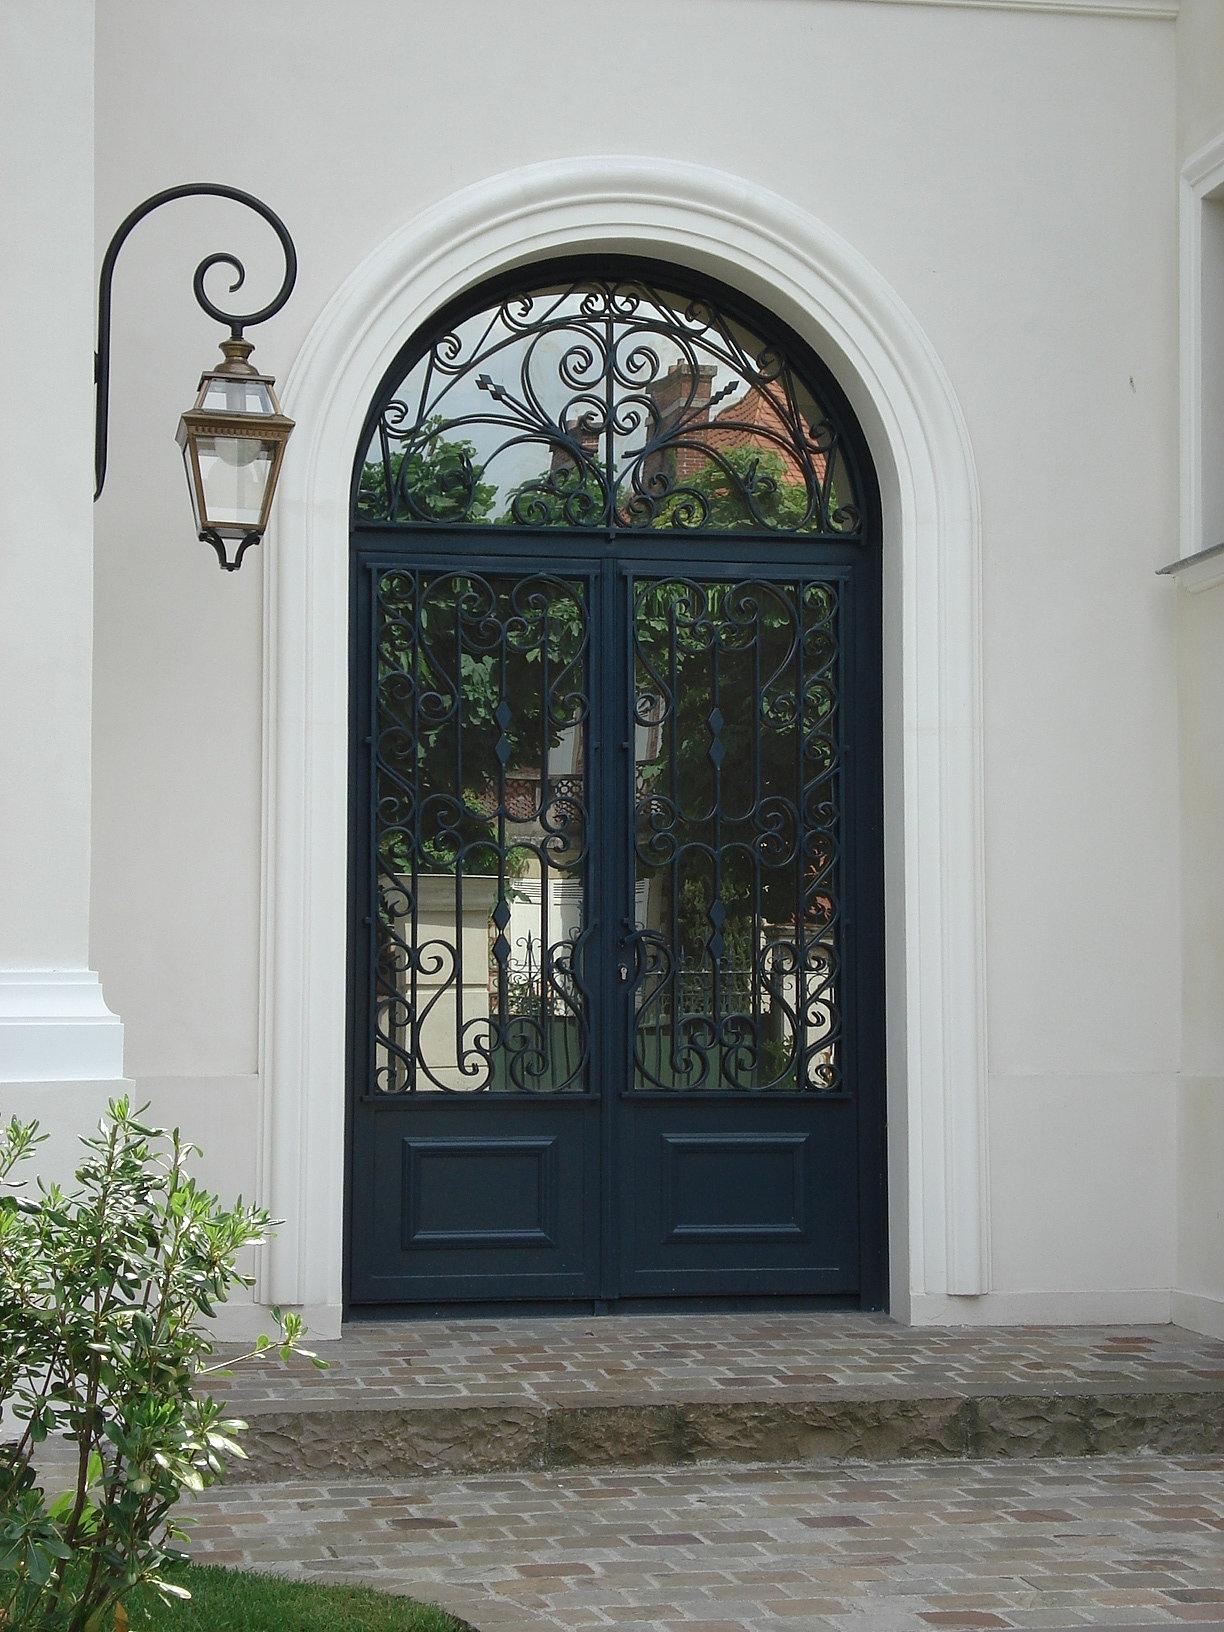 Amazing Porte D Entree Fer Forge #7: Charming Porte D Entree Fer Forge #1:  842aed_7286f6b8bc60b6939dbadee04d06eebe.jpg_srz_1224_1632_85_22_0.50_1.20_0